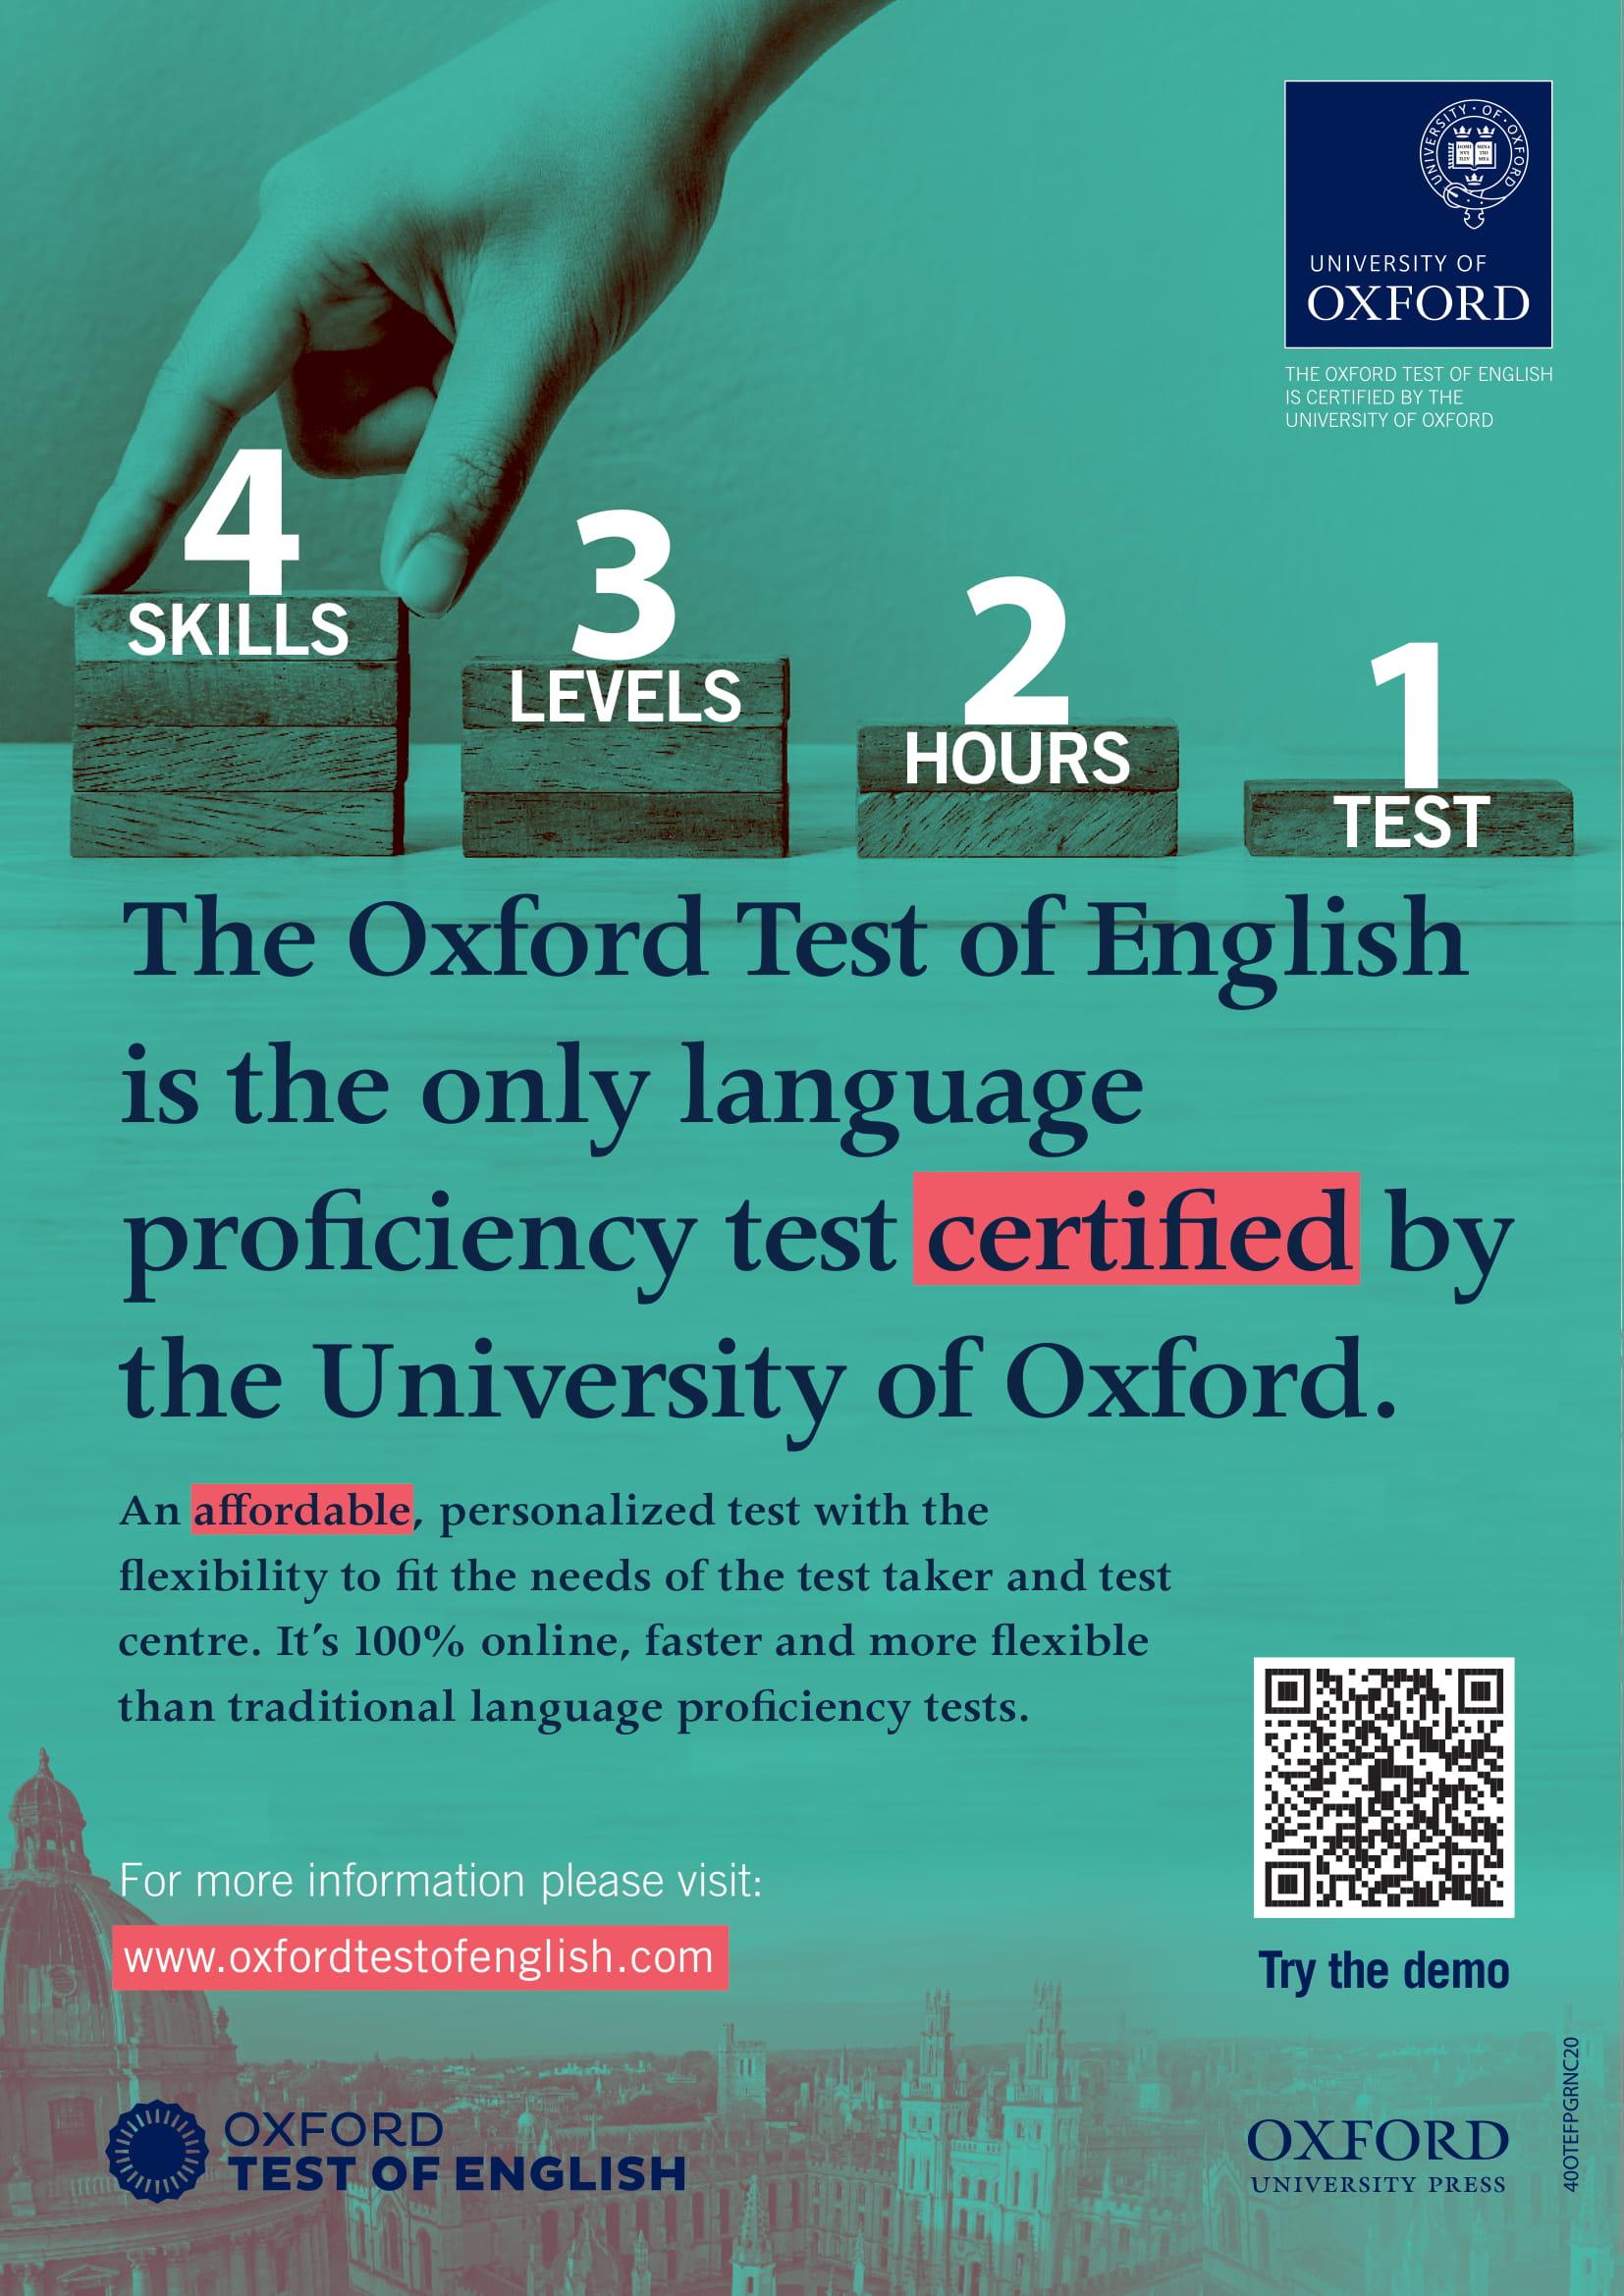 Oxford Test